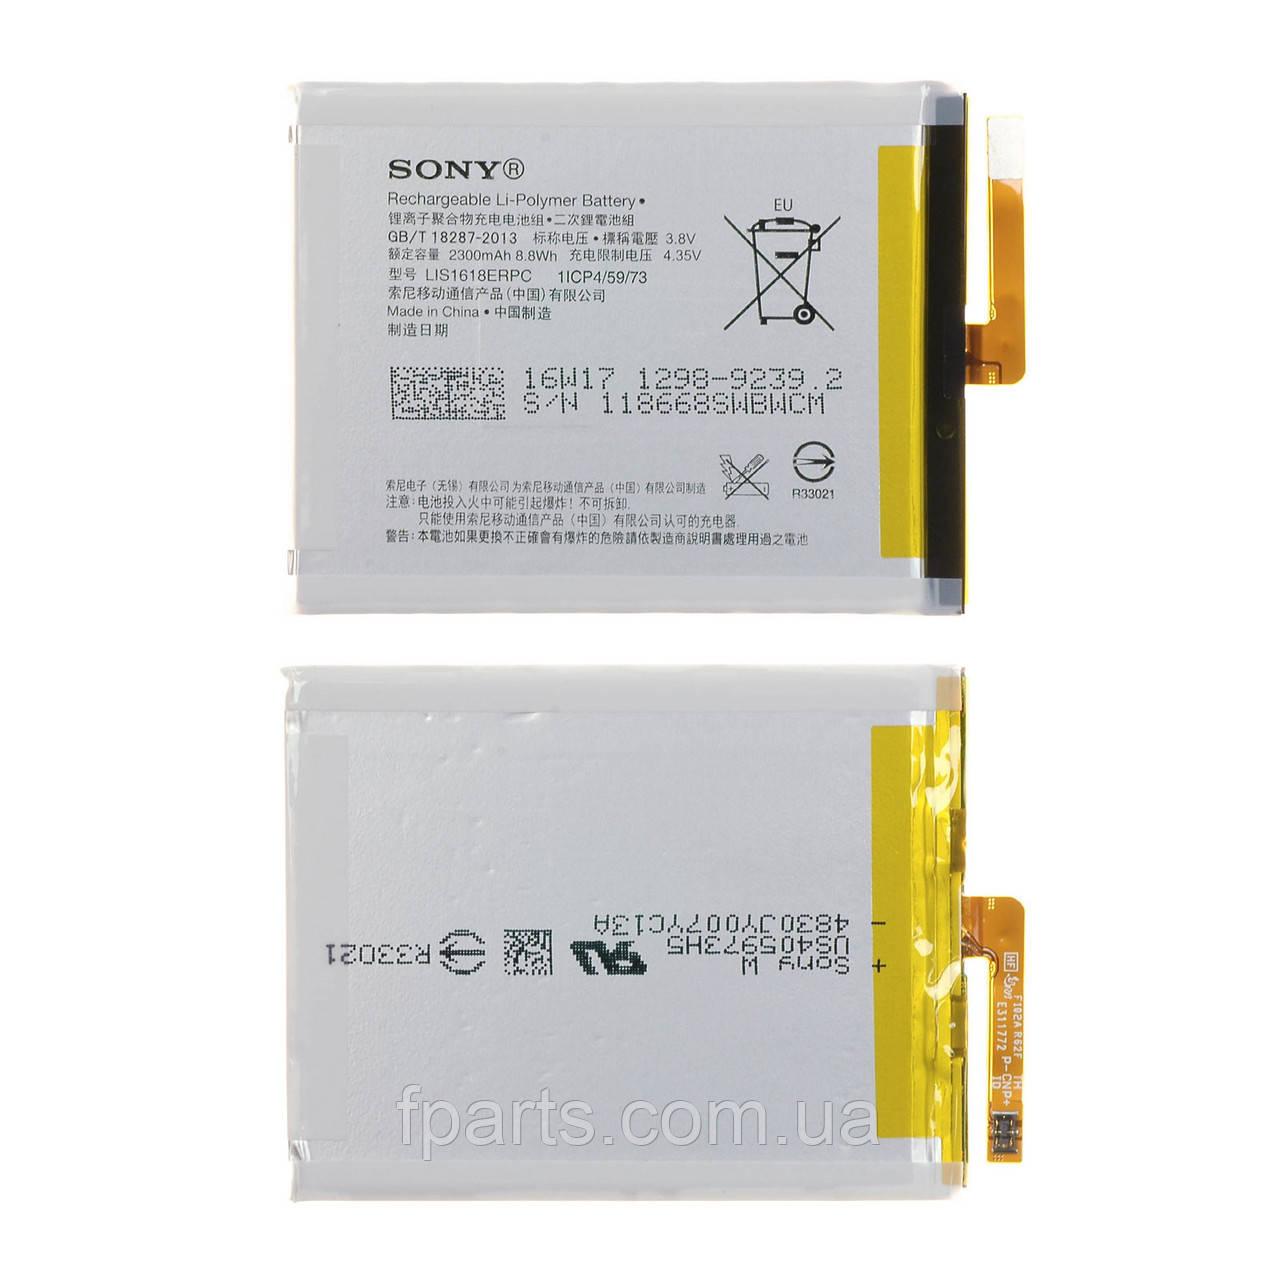 Аккумулятор Sony Xperia XA (F3111, F3112) Xperia XA1 (G3112, G3116) LIS1618ERPC